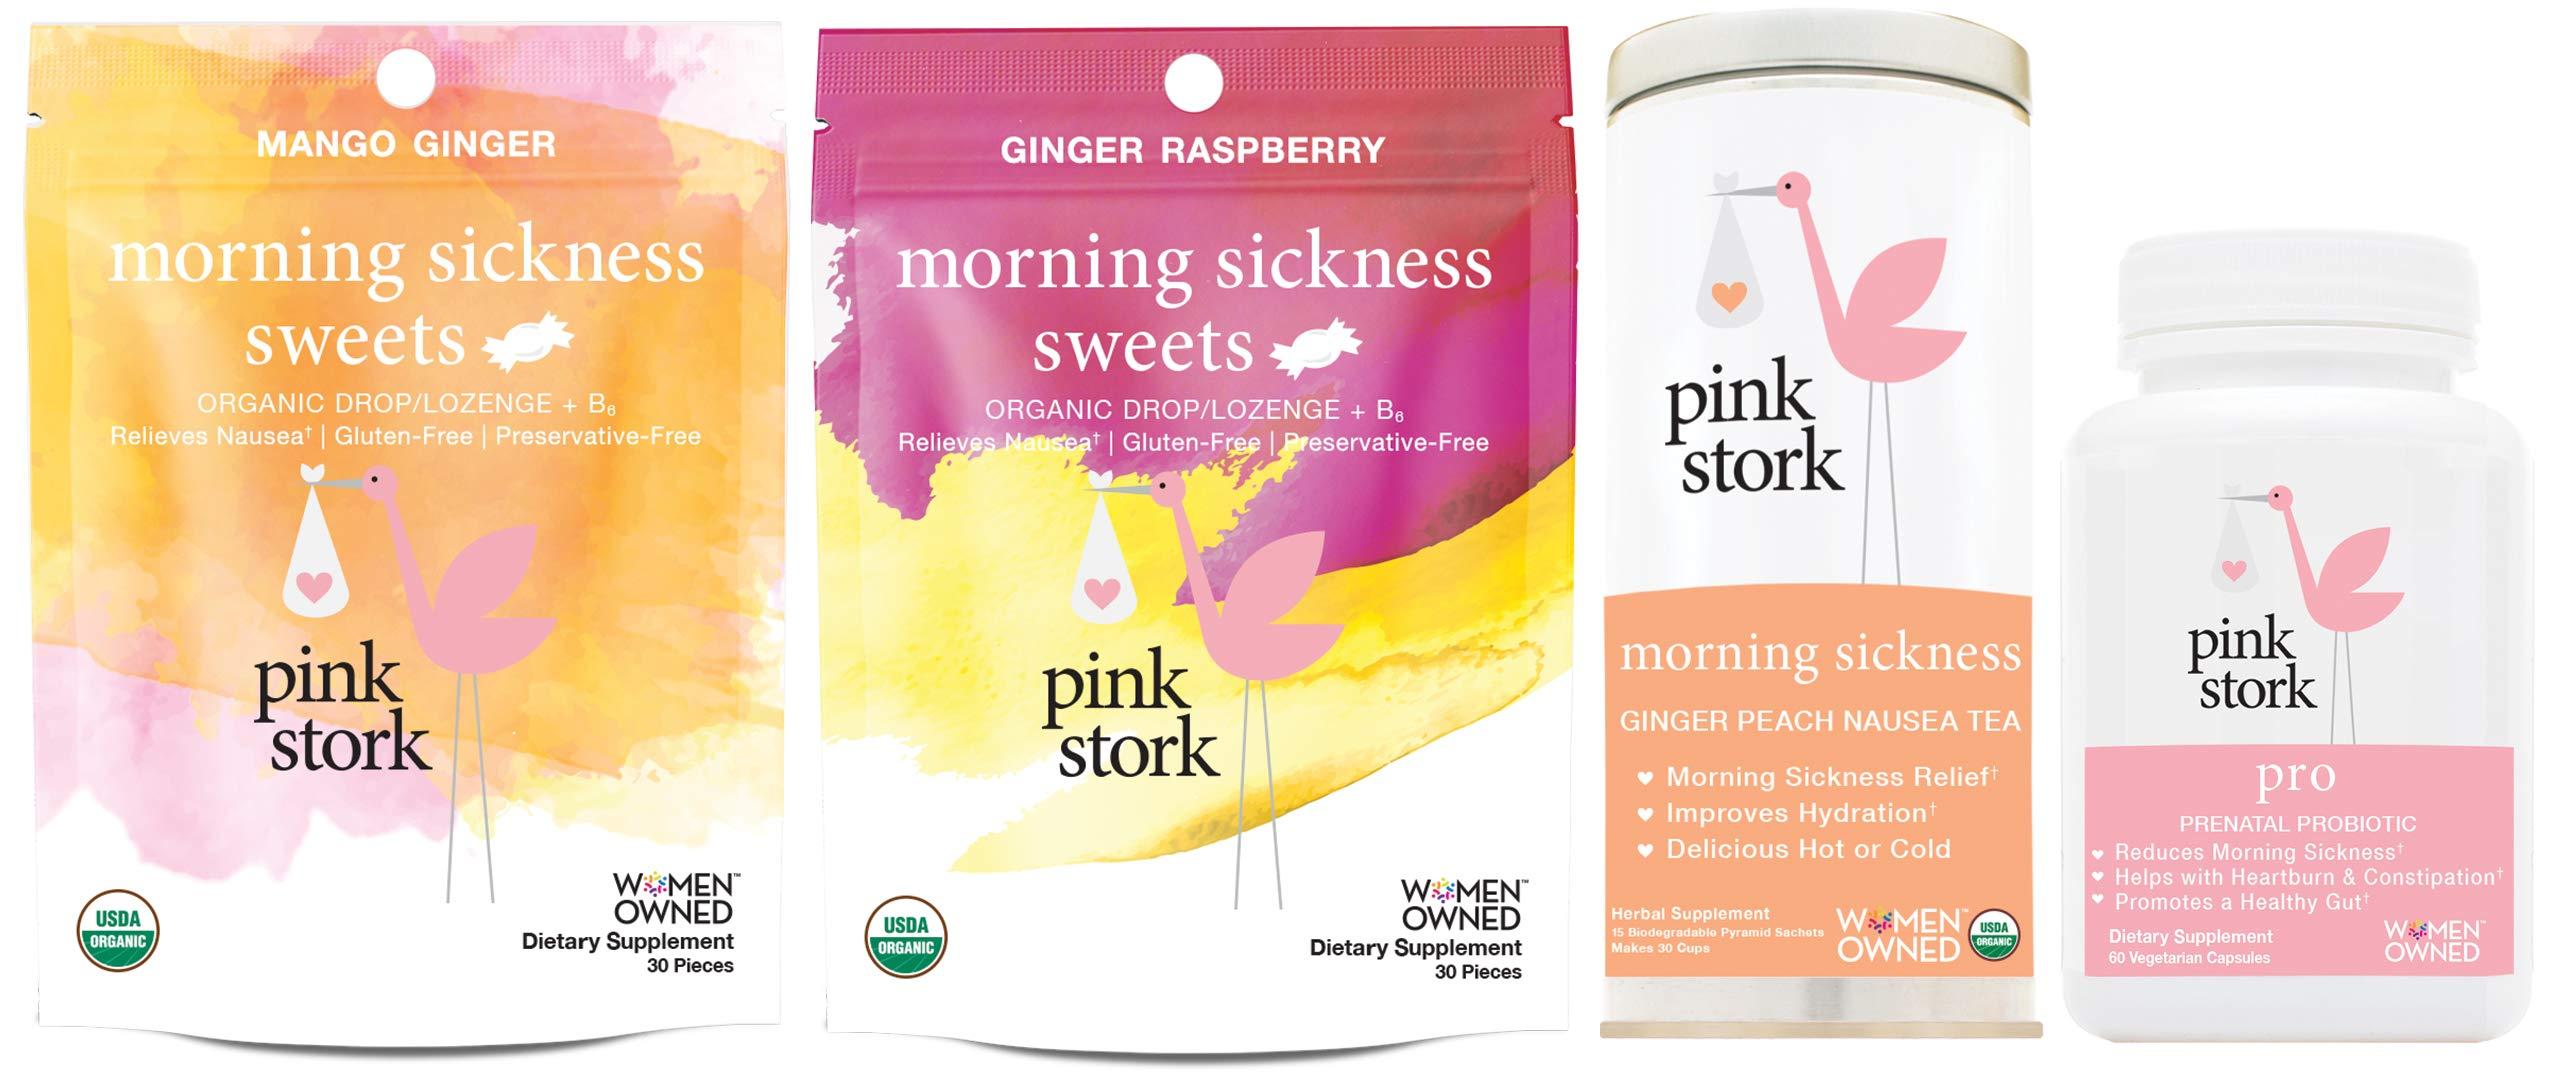 Pink Stork Morning Sickness Bundle: New & Improved Nausea Relief with Pink Stork Pro, Morning Sickness Tea, and Morning Sickness Sweets by Pink Stork